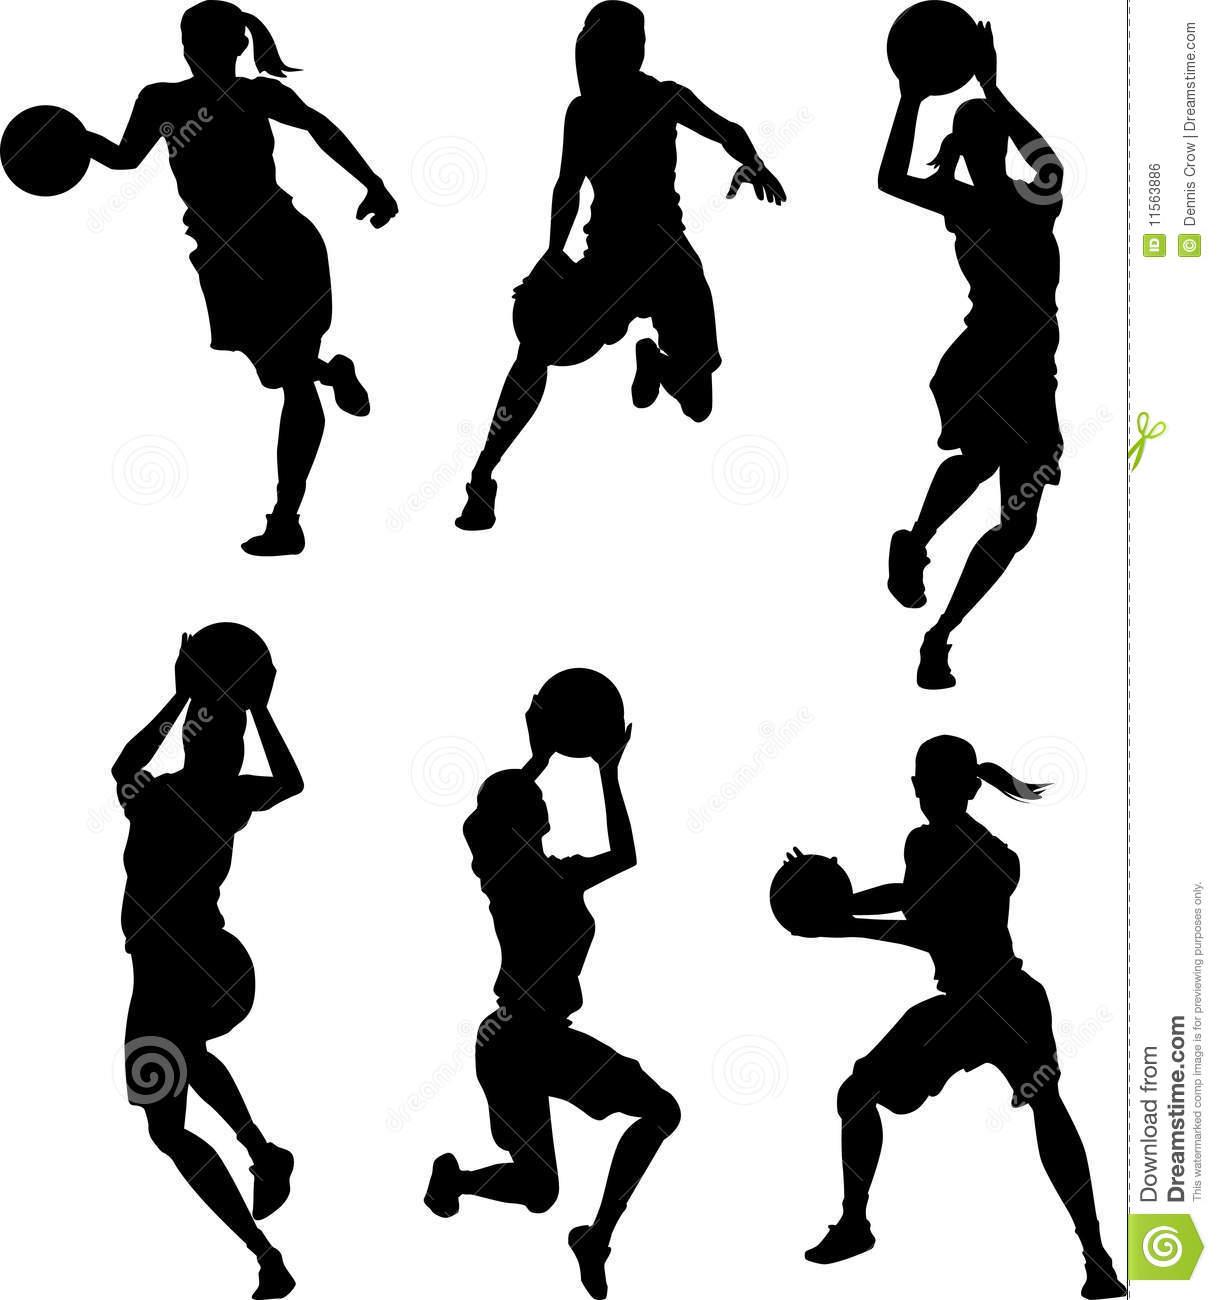 Basketball Female Silhouettes.